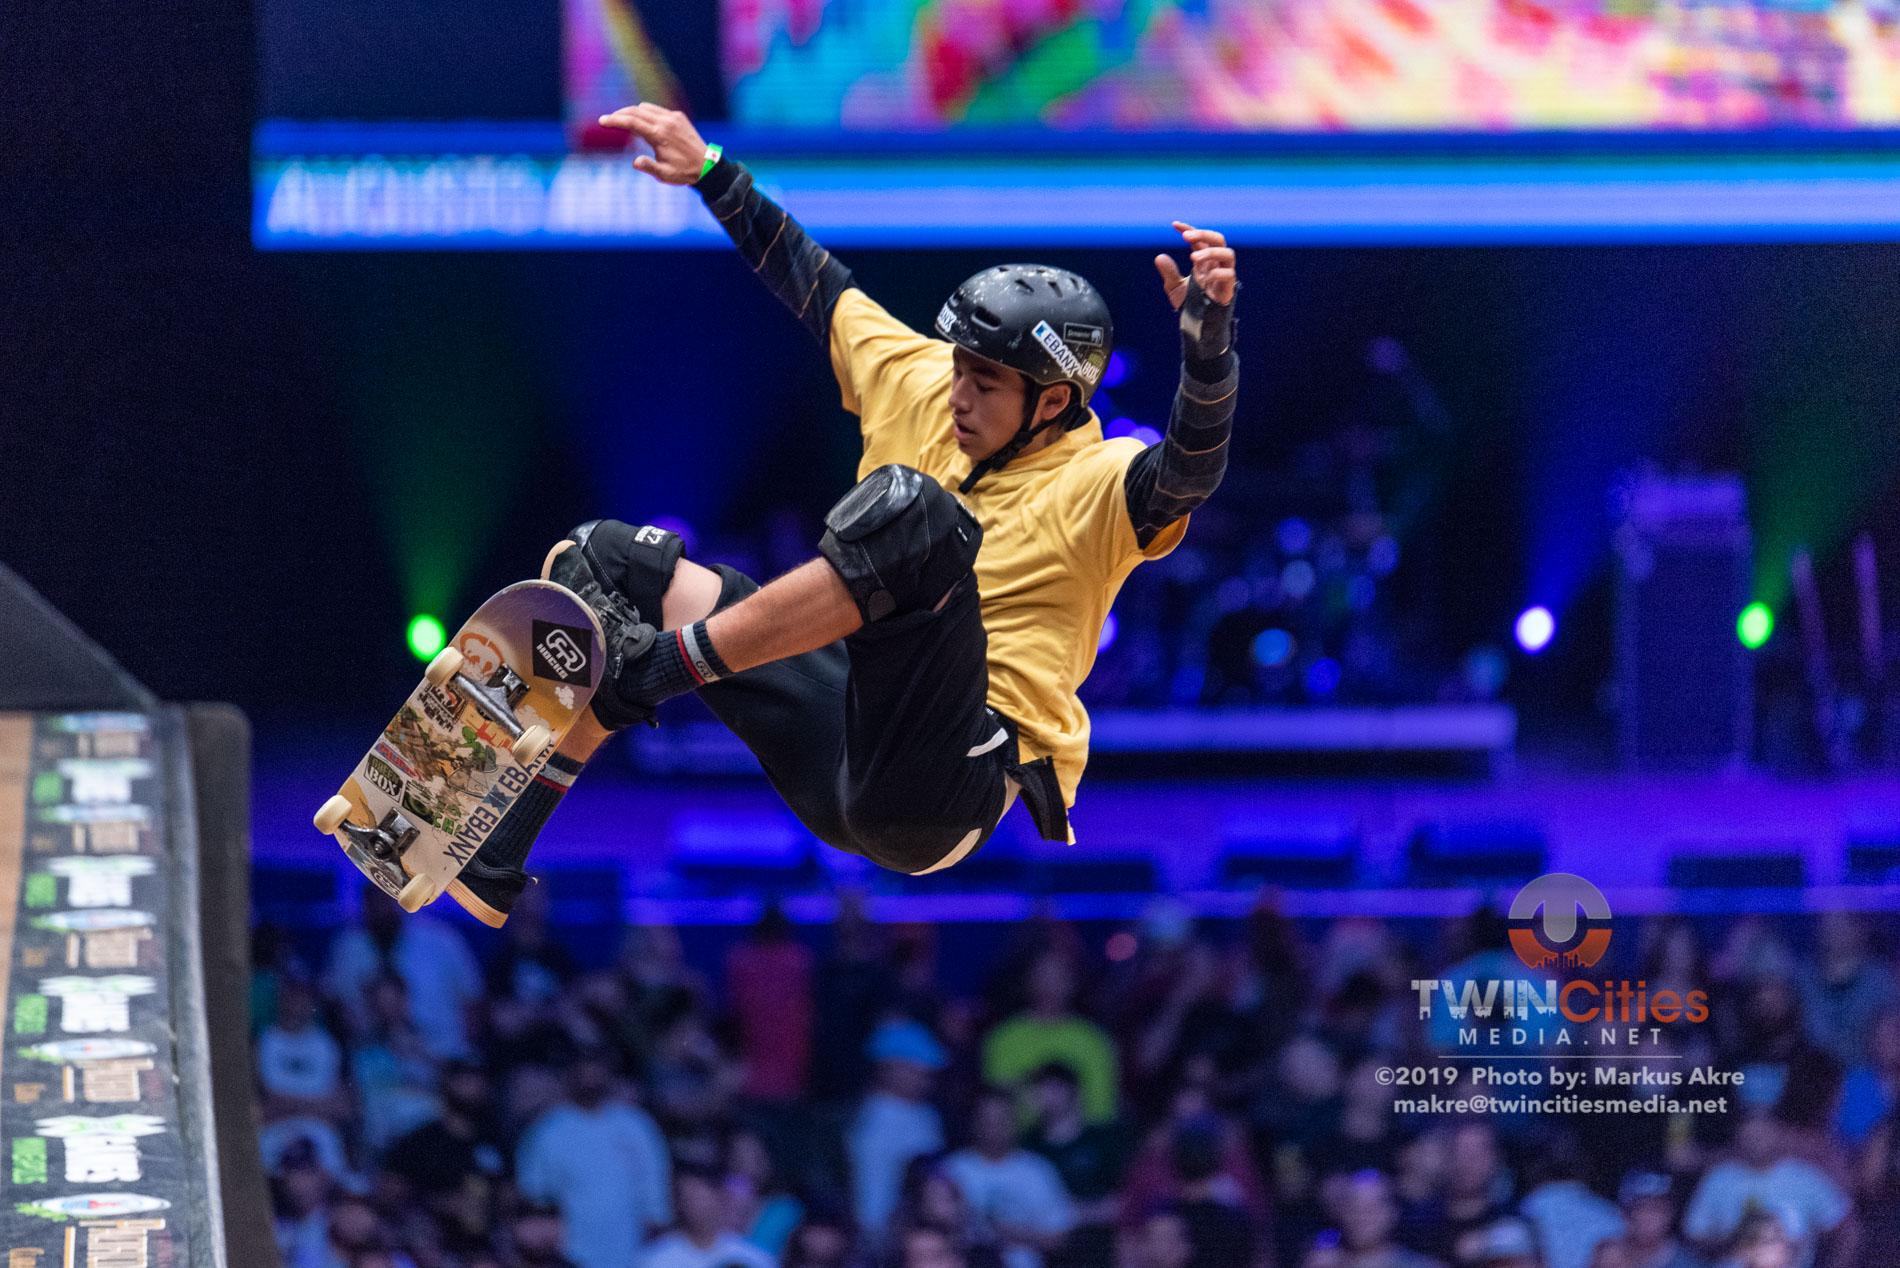 2019-X-Games-Day-1-Skateboard-Vert-16